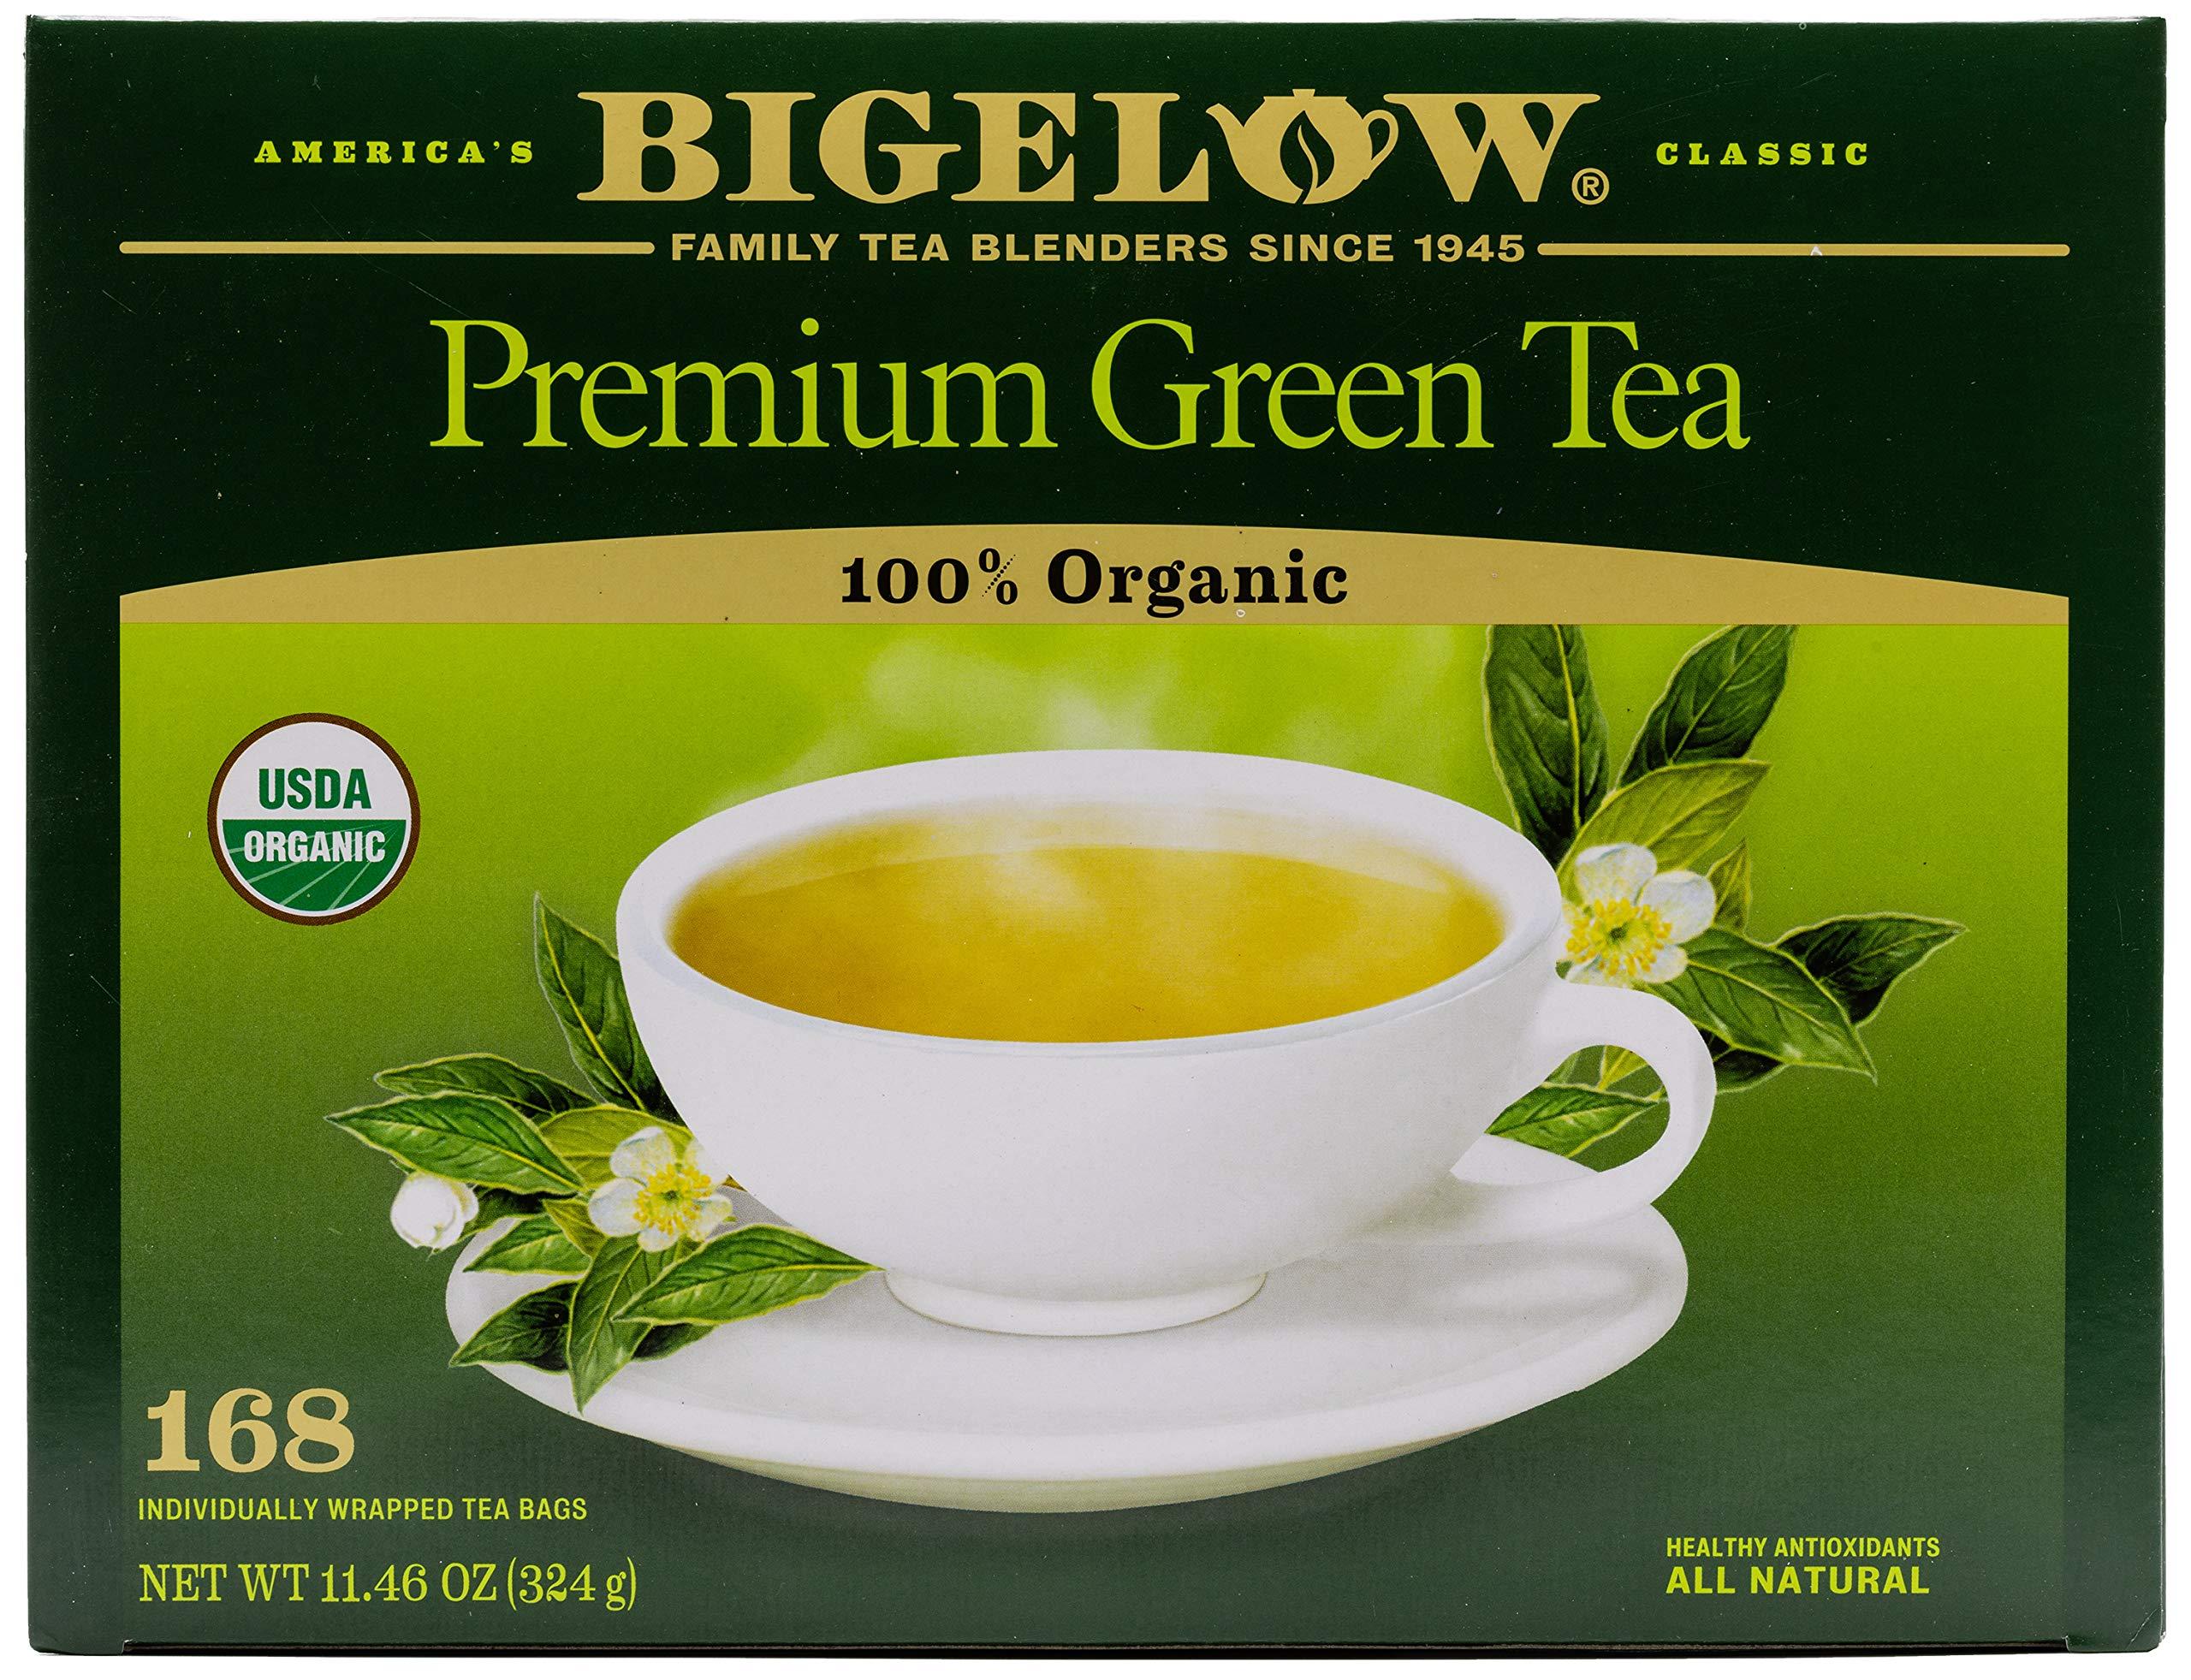 Bigelow Premium USDA Organic Green Tea Bags, 168 Count Box, Caffeinated Individual Green Tea Bags, for Hot Tea or Iced Tea, Drink Plain or Sweetened with Honey or Sugar by Bigelow Tea